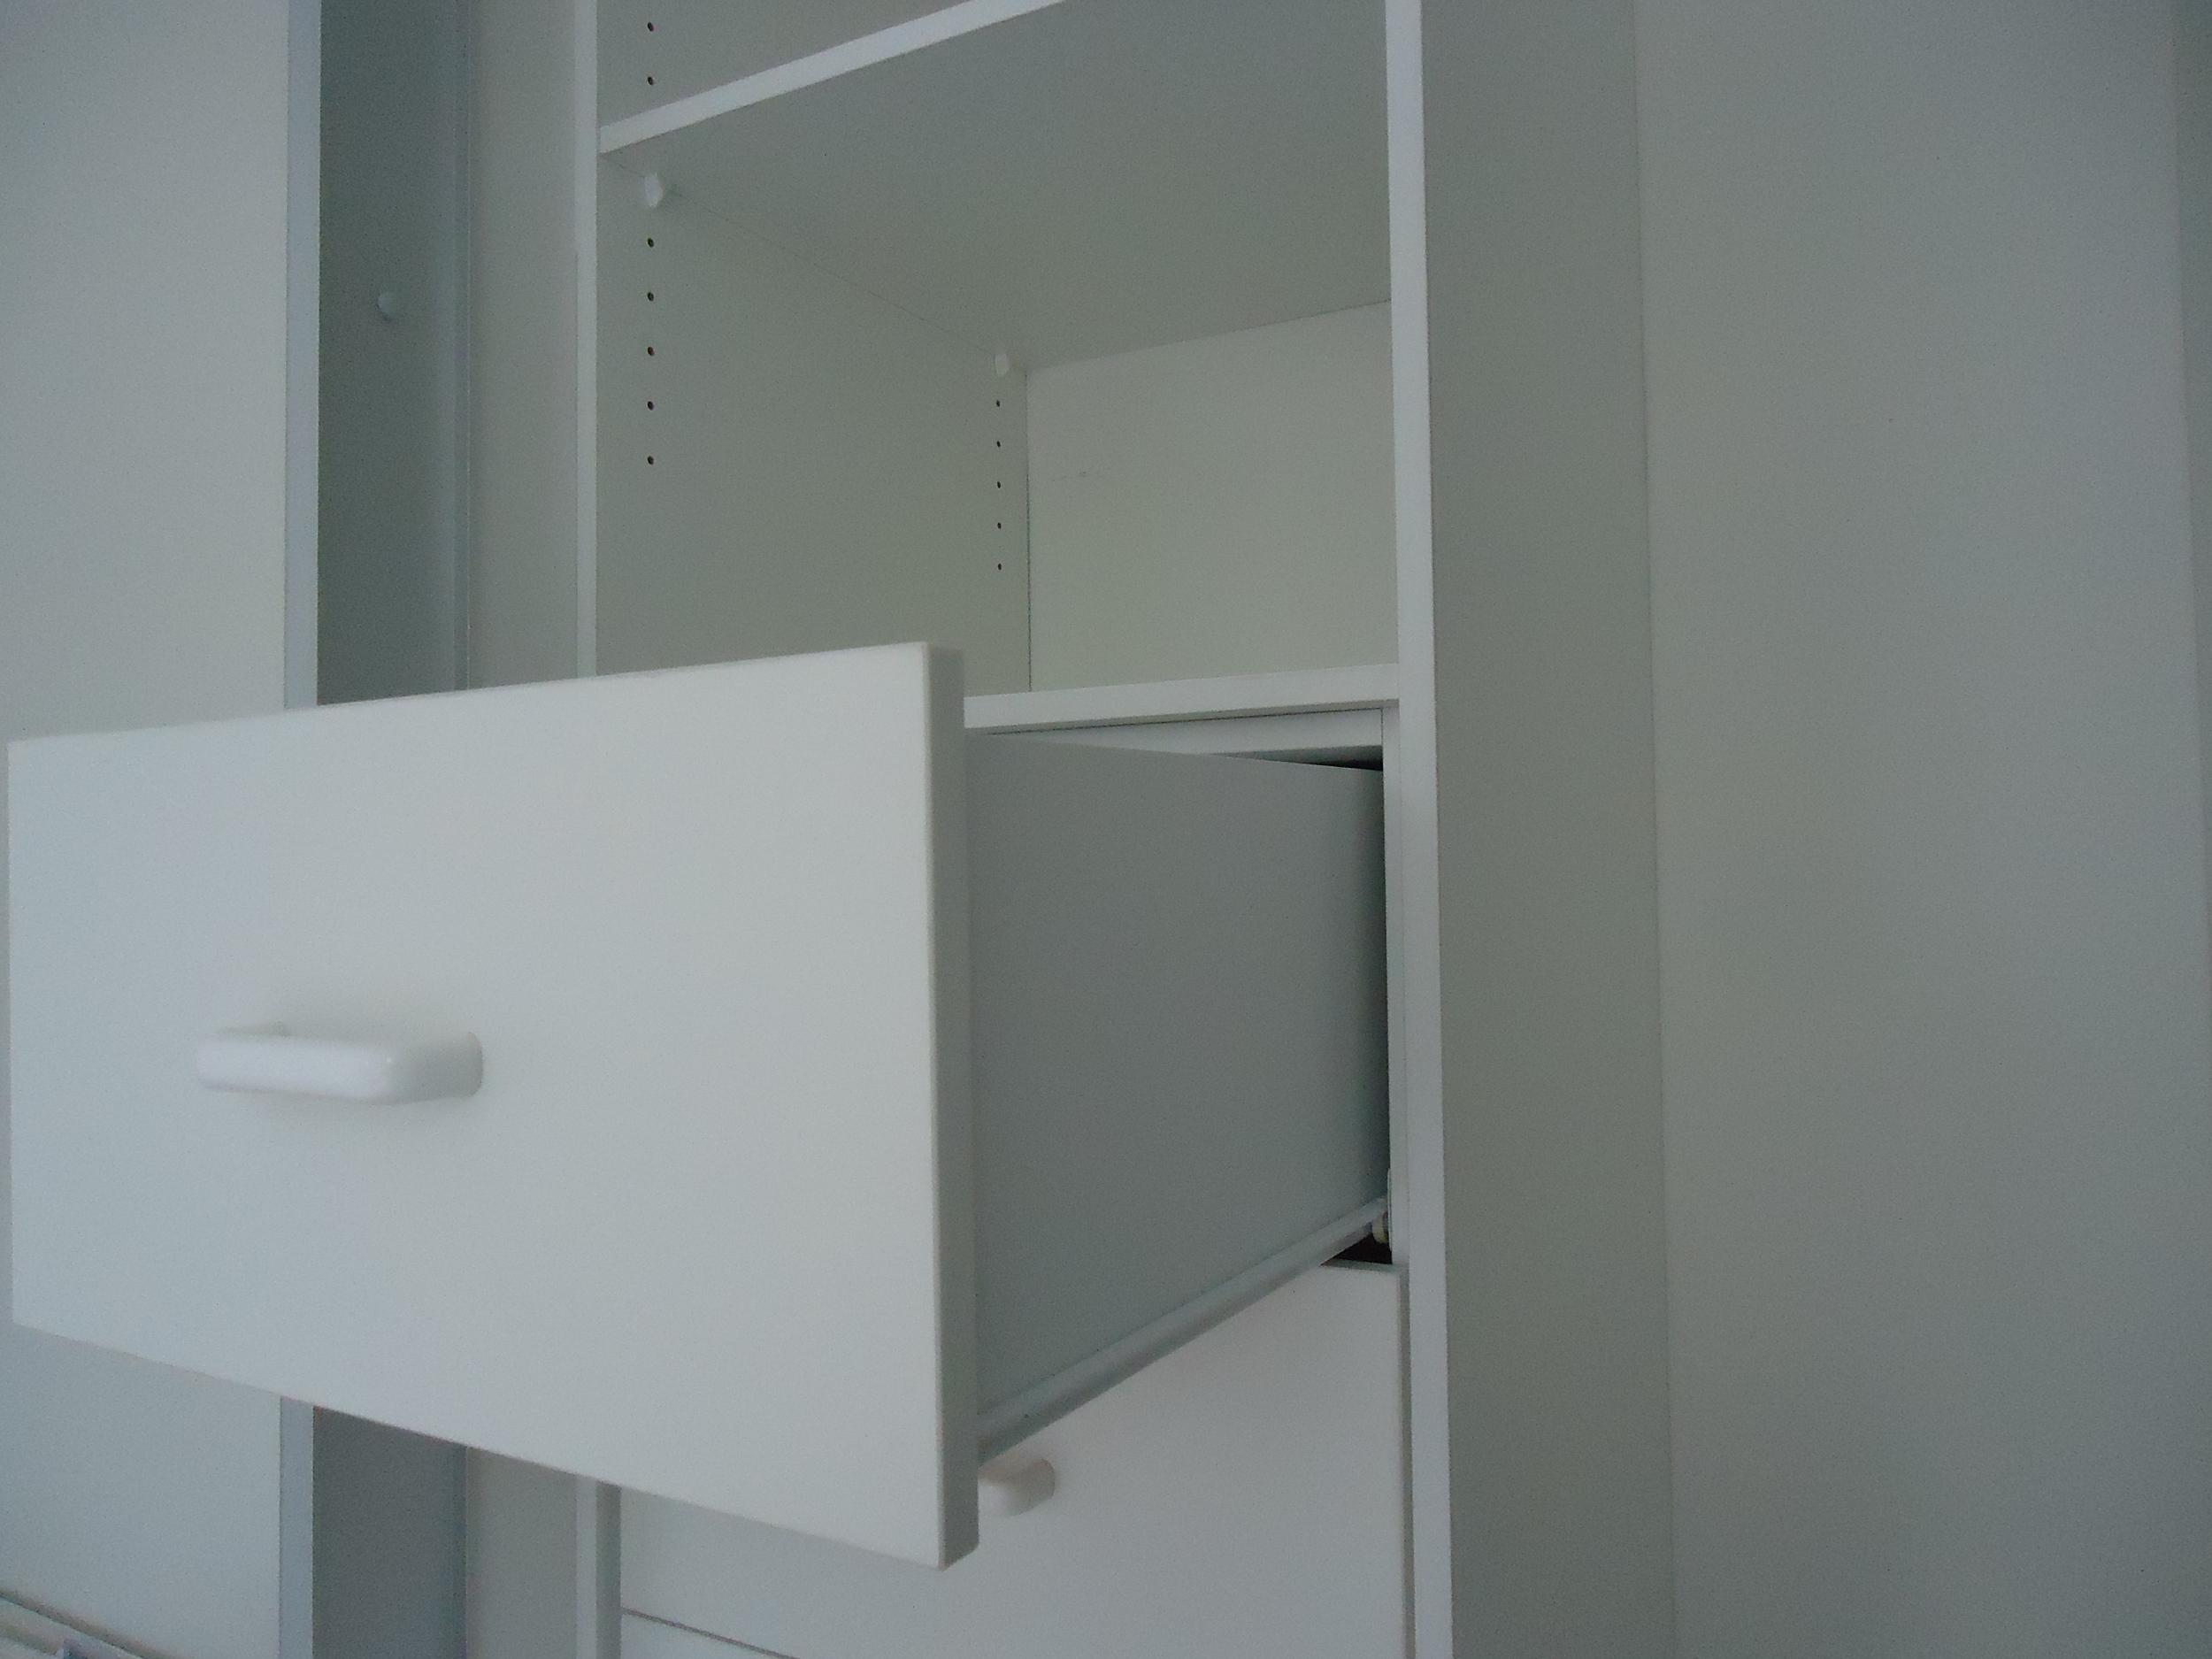 wardrobe standard drawer unit.JPG